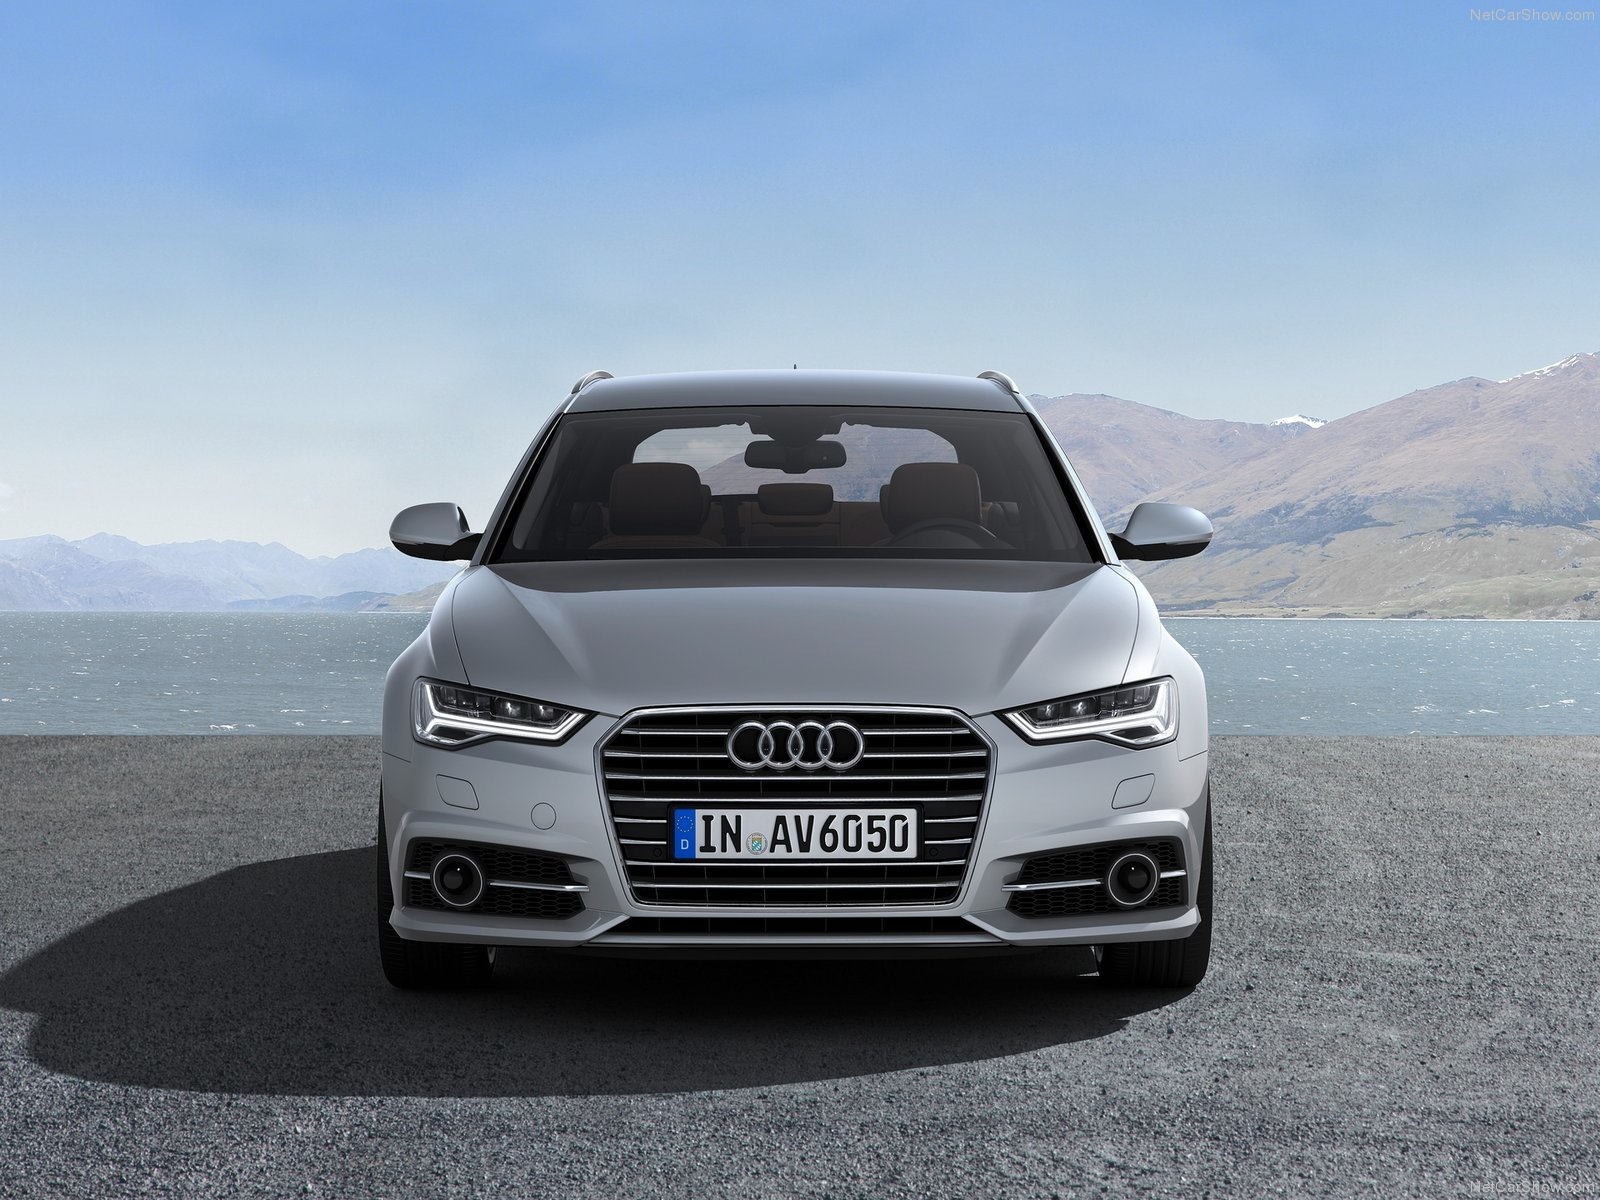 Audi A6 2015 9 12